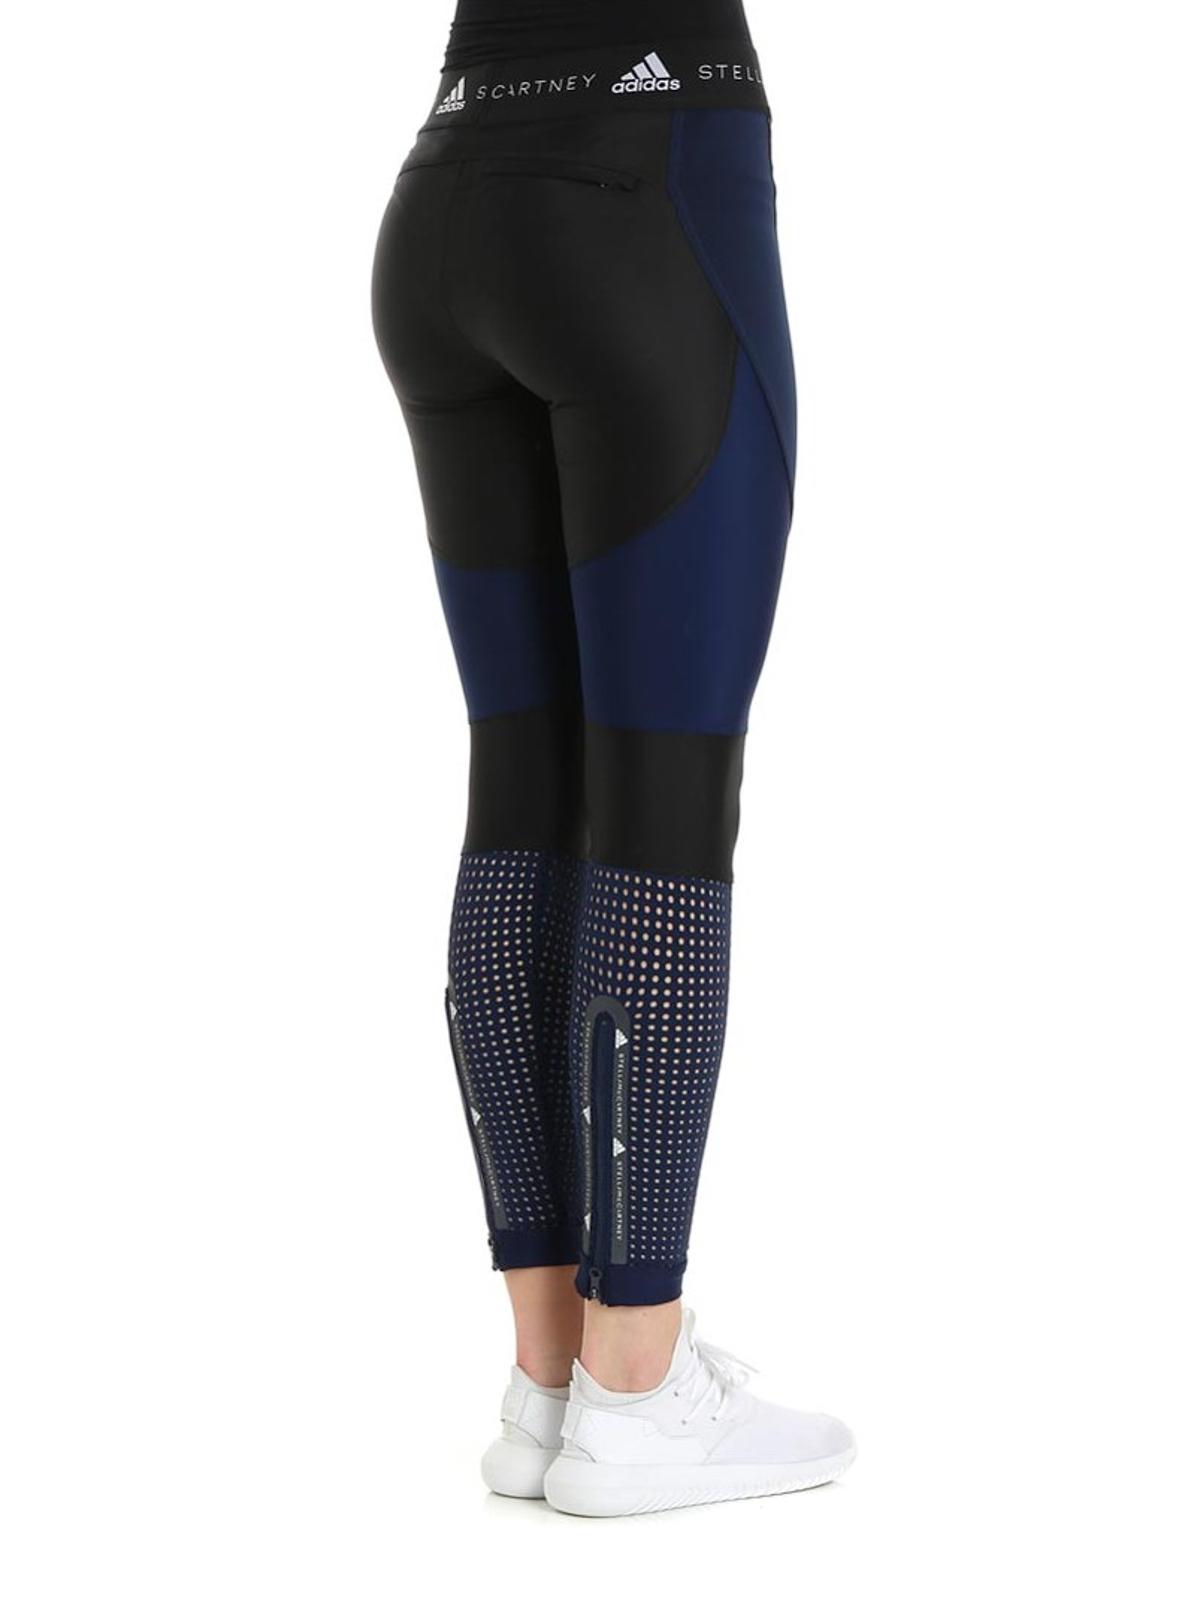 a8e41bb9366f76 iKRIX ADIDAS BY STELLA MCCARTNEY: leggings - Recycled jersey training tights